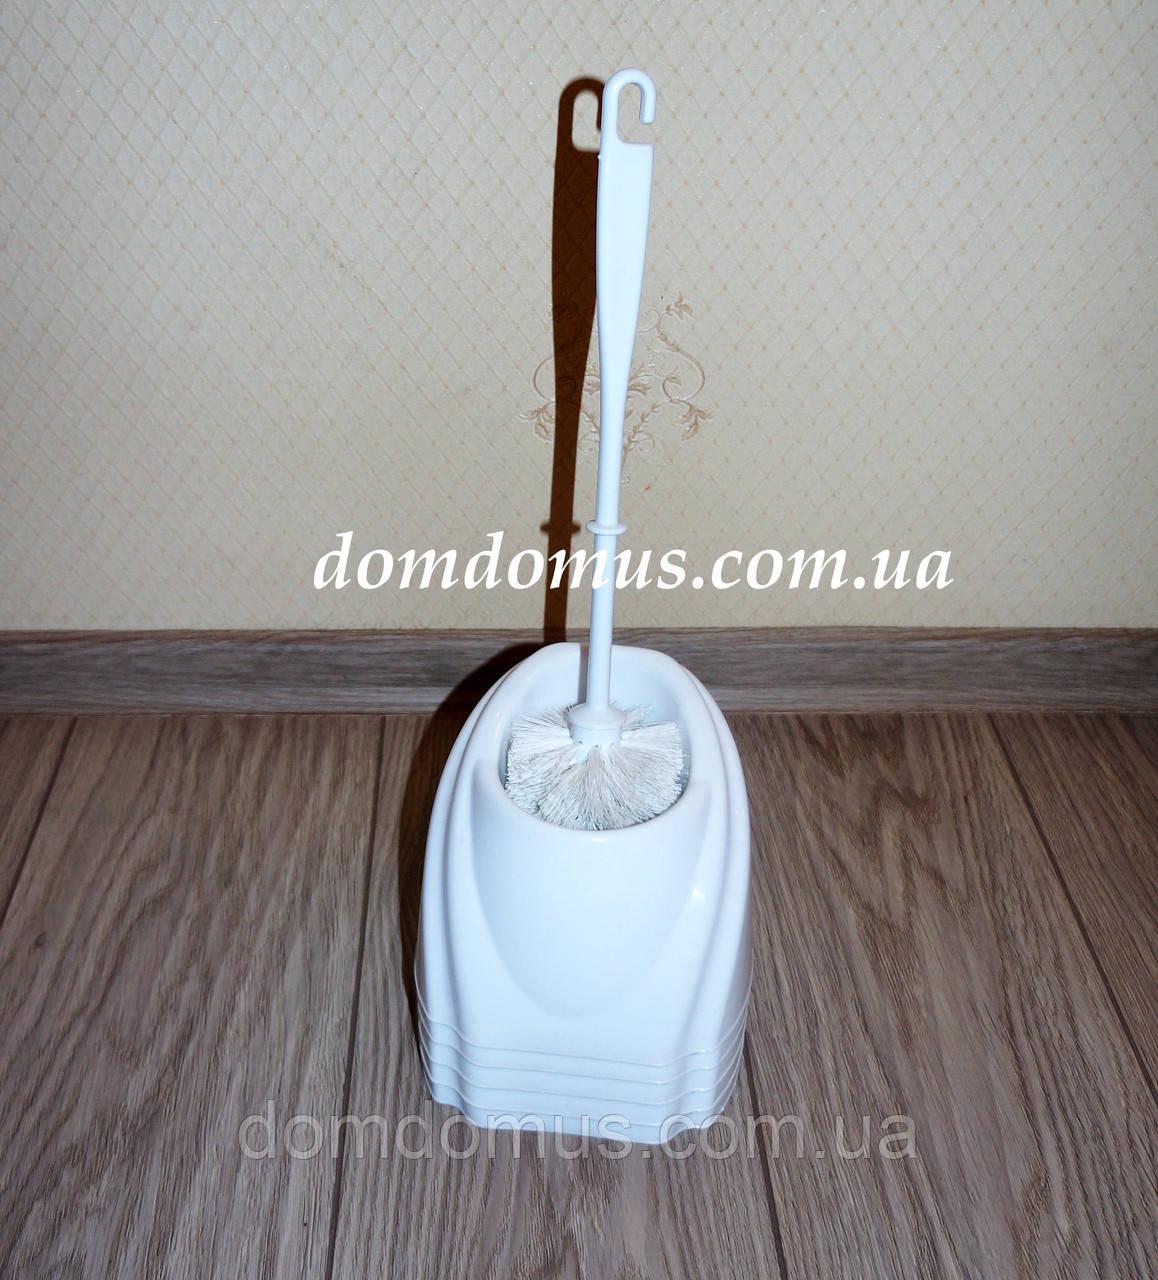 Комплект для туалета (ершик с подставкой)